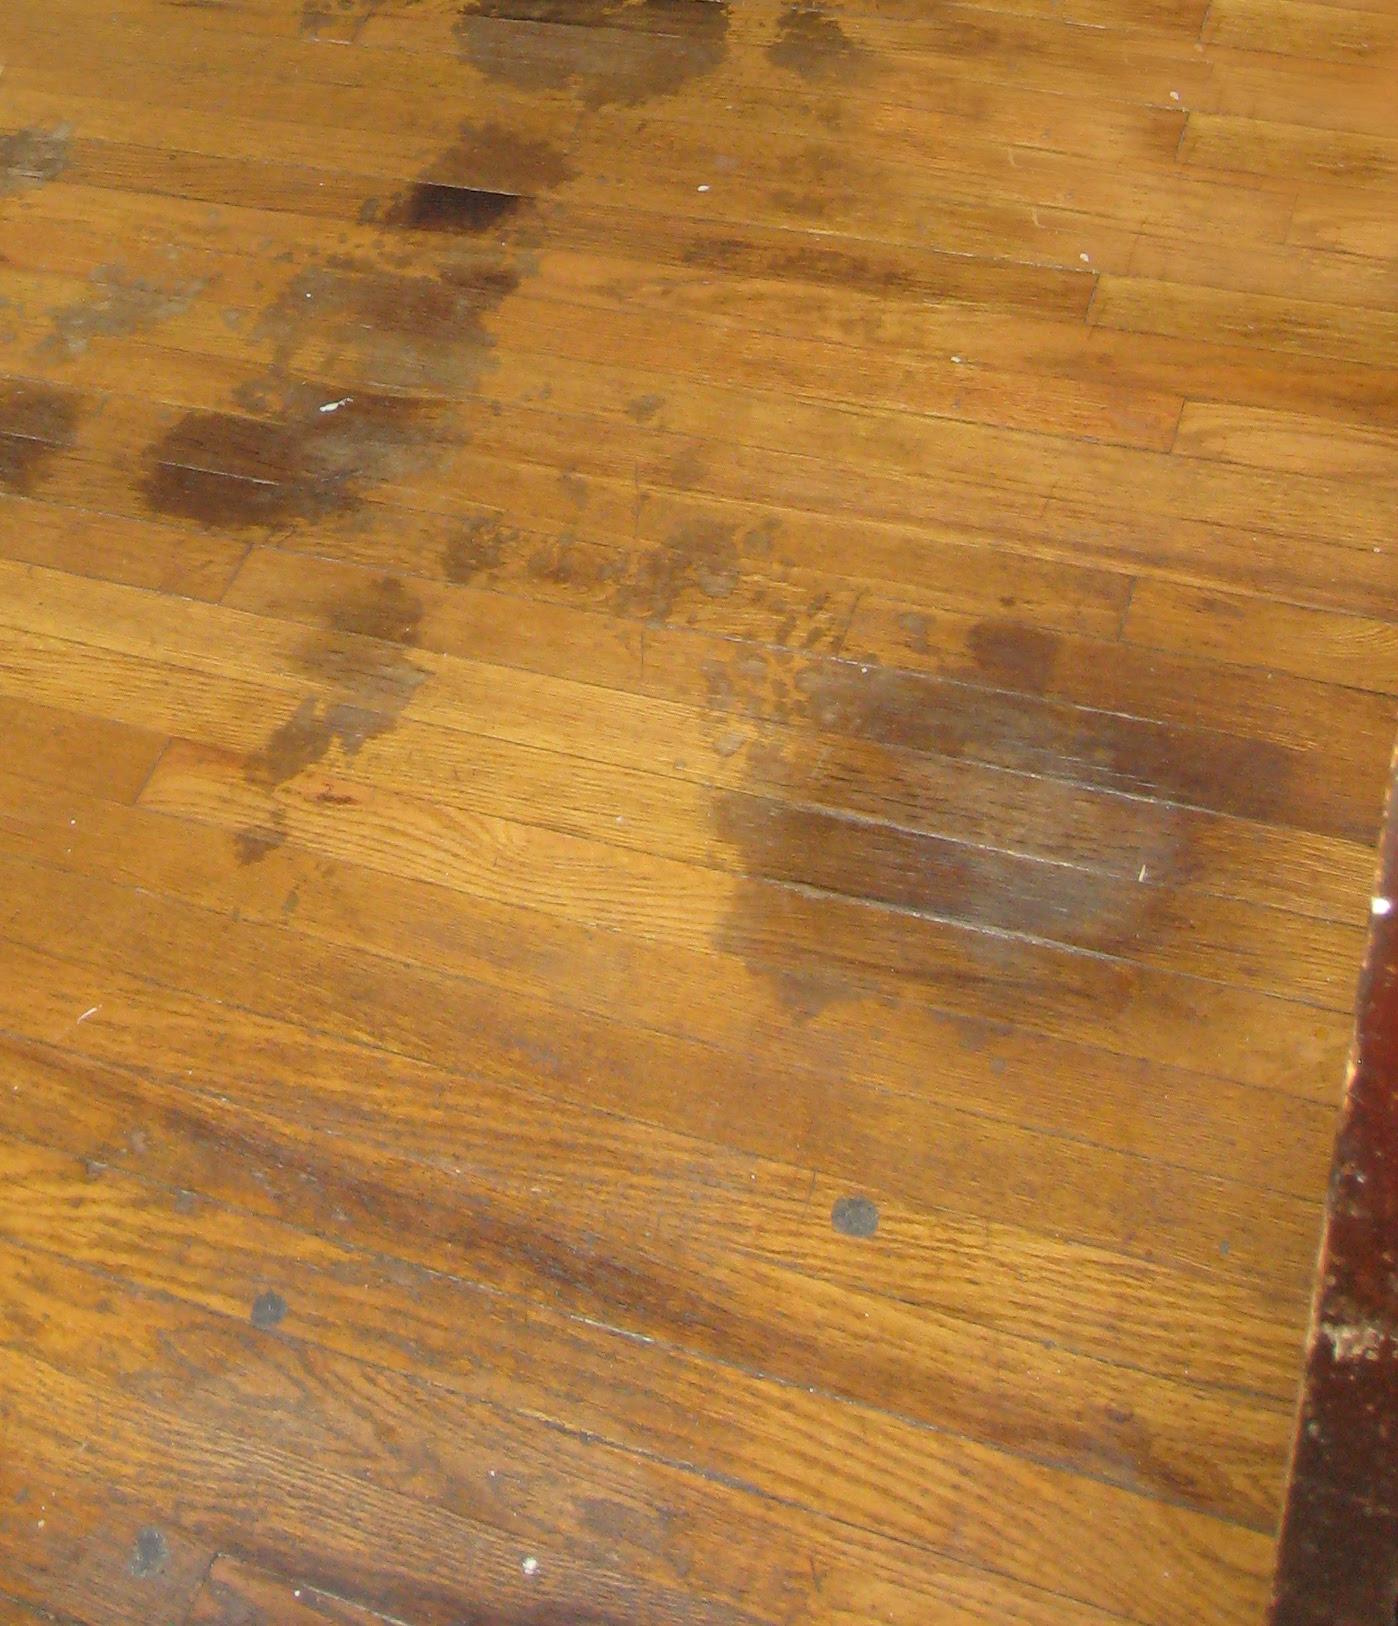 woodfloor_stains1